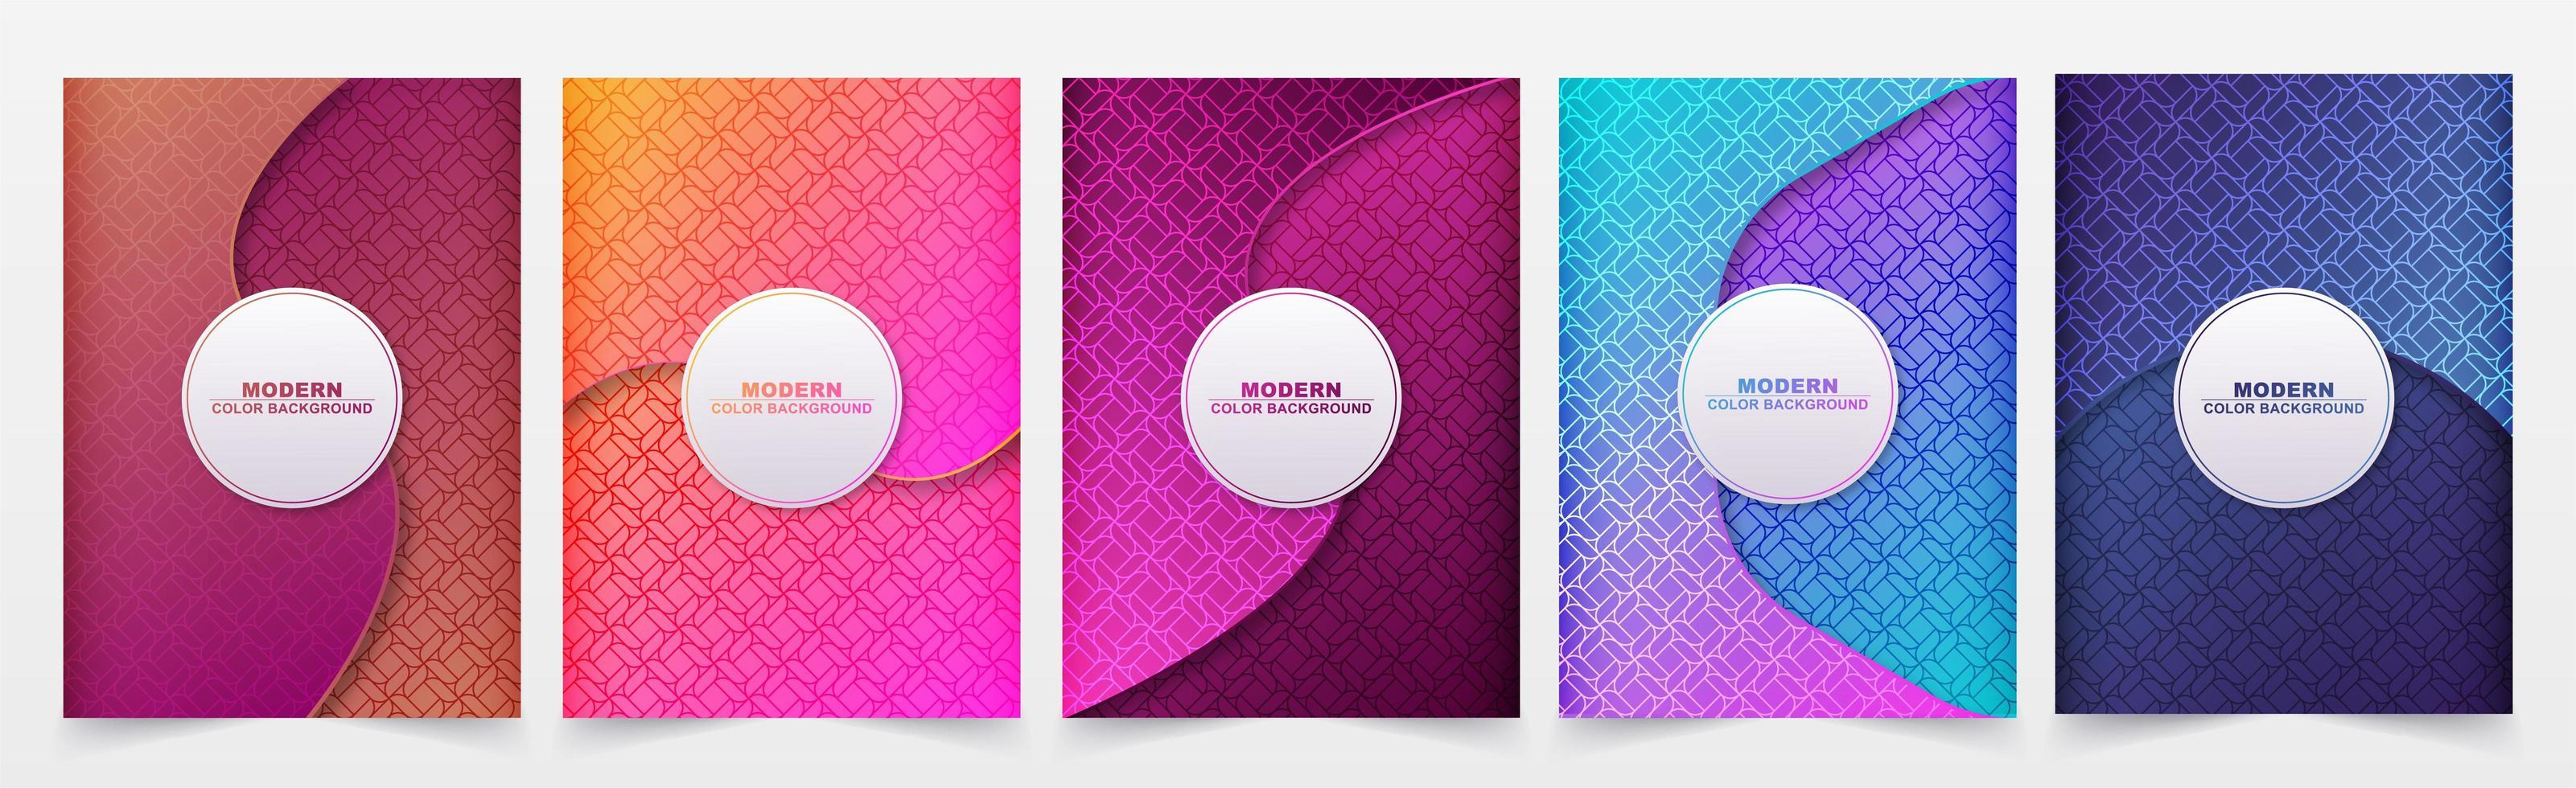 Gradient curved design patterned cover set vector